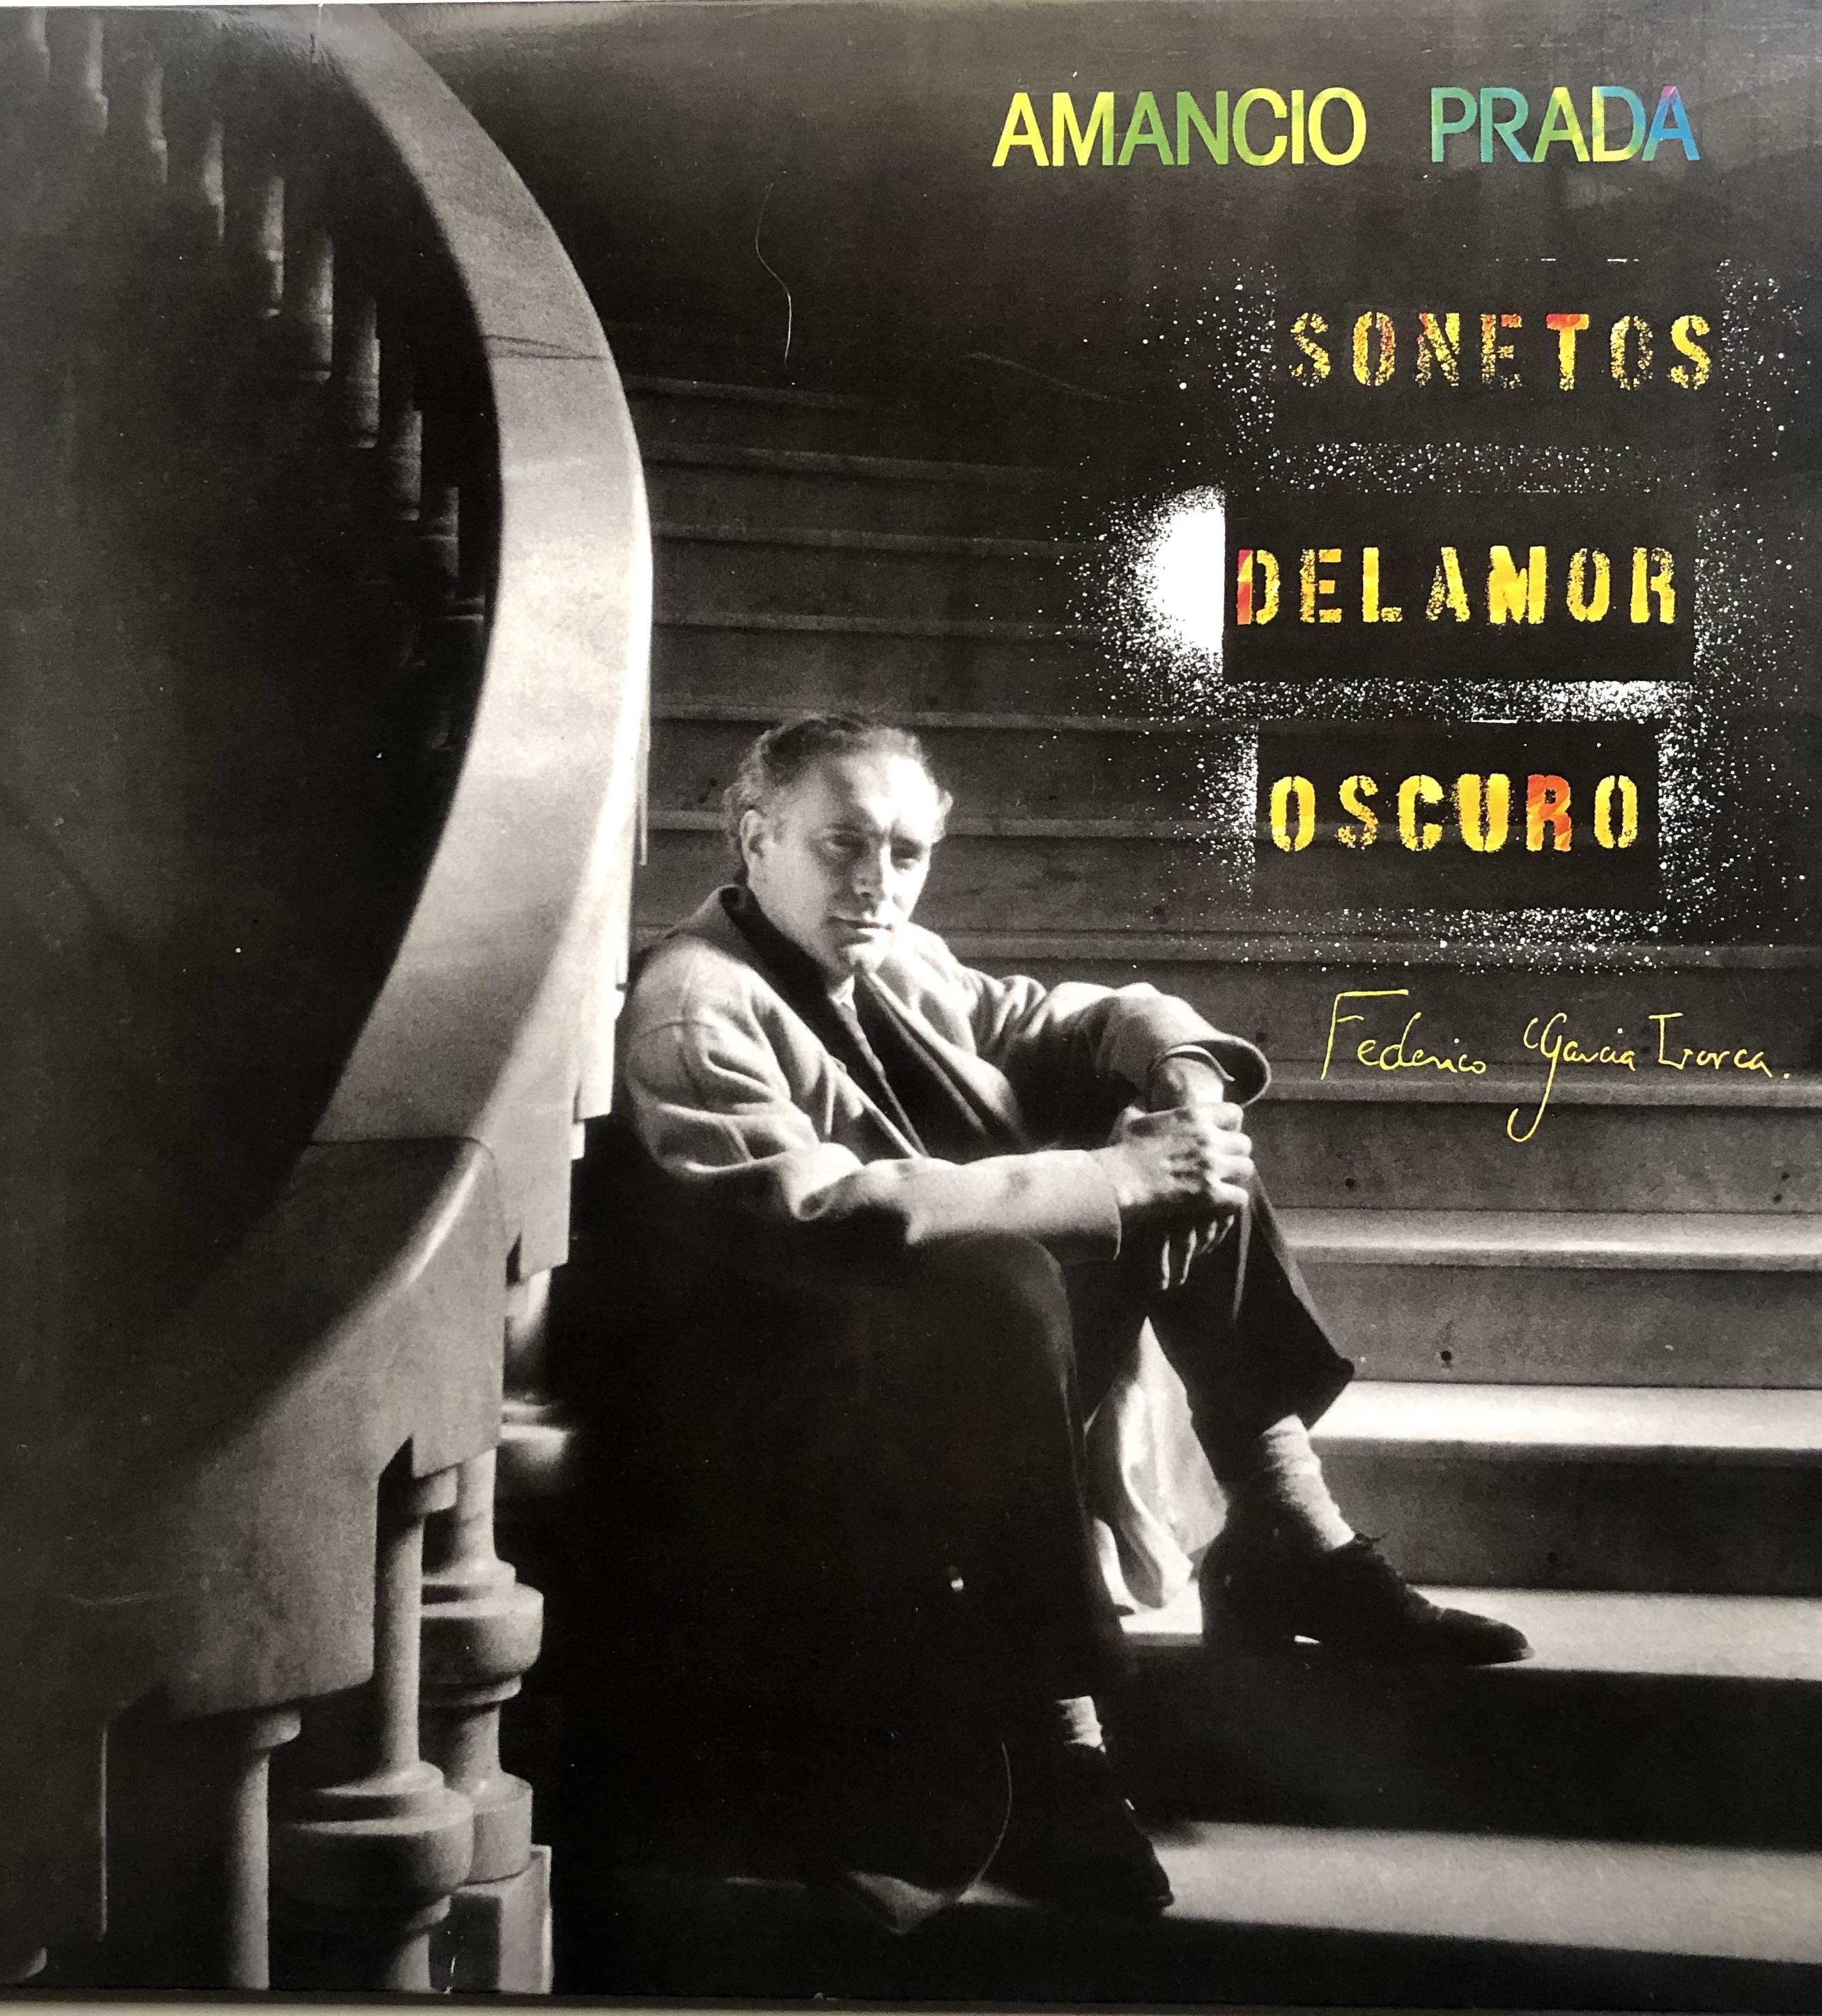 SONETOS DEL AMOR OSCURO 1